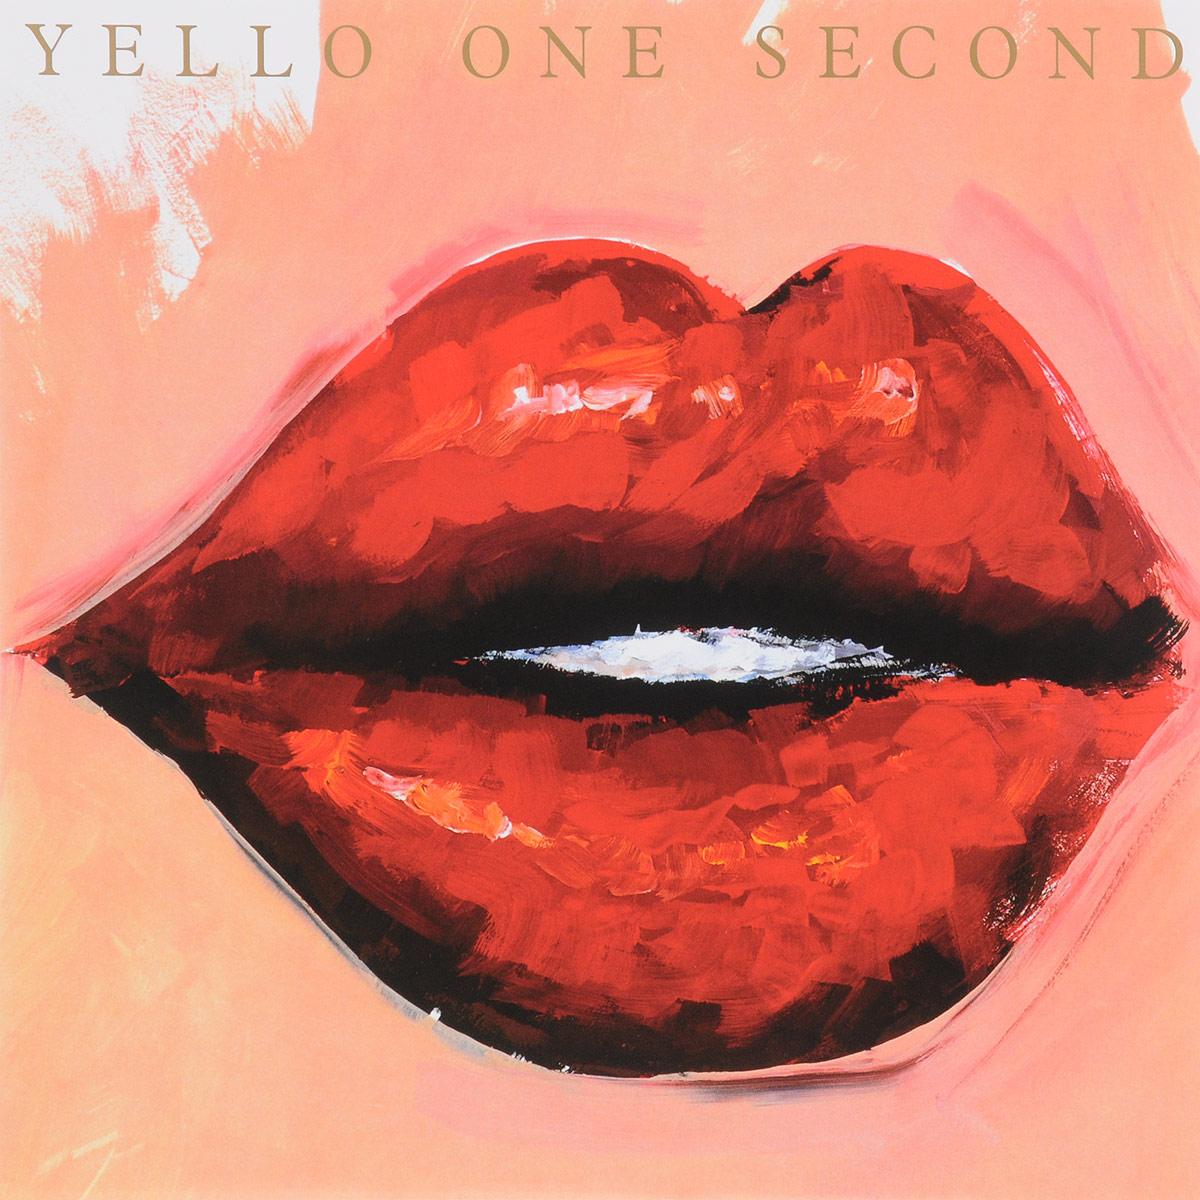 """Yello"" Yello. One Second (LP)"